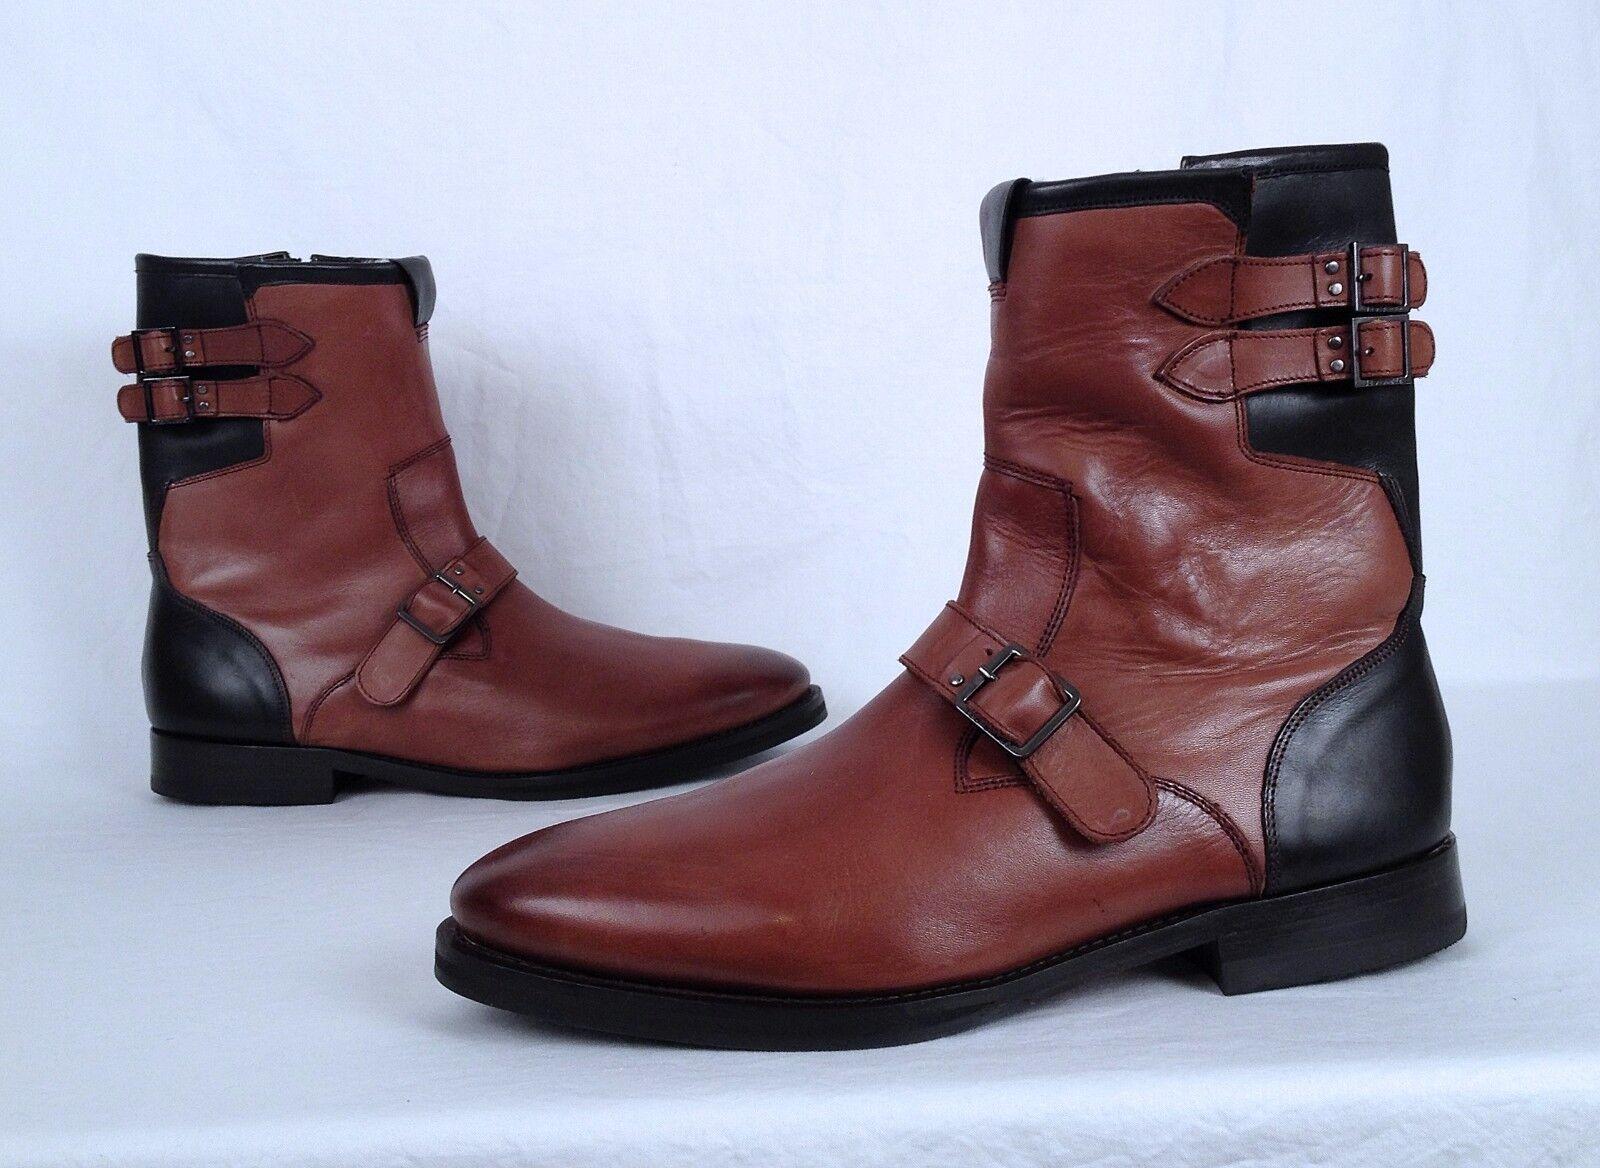 NEW   Ted Baker 'Decola'  Leather Stiefel- braun- Größe 11 US   330  (MB)